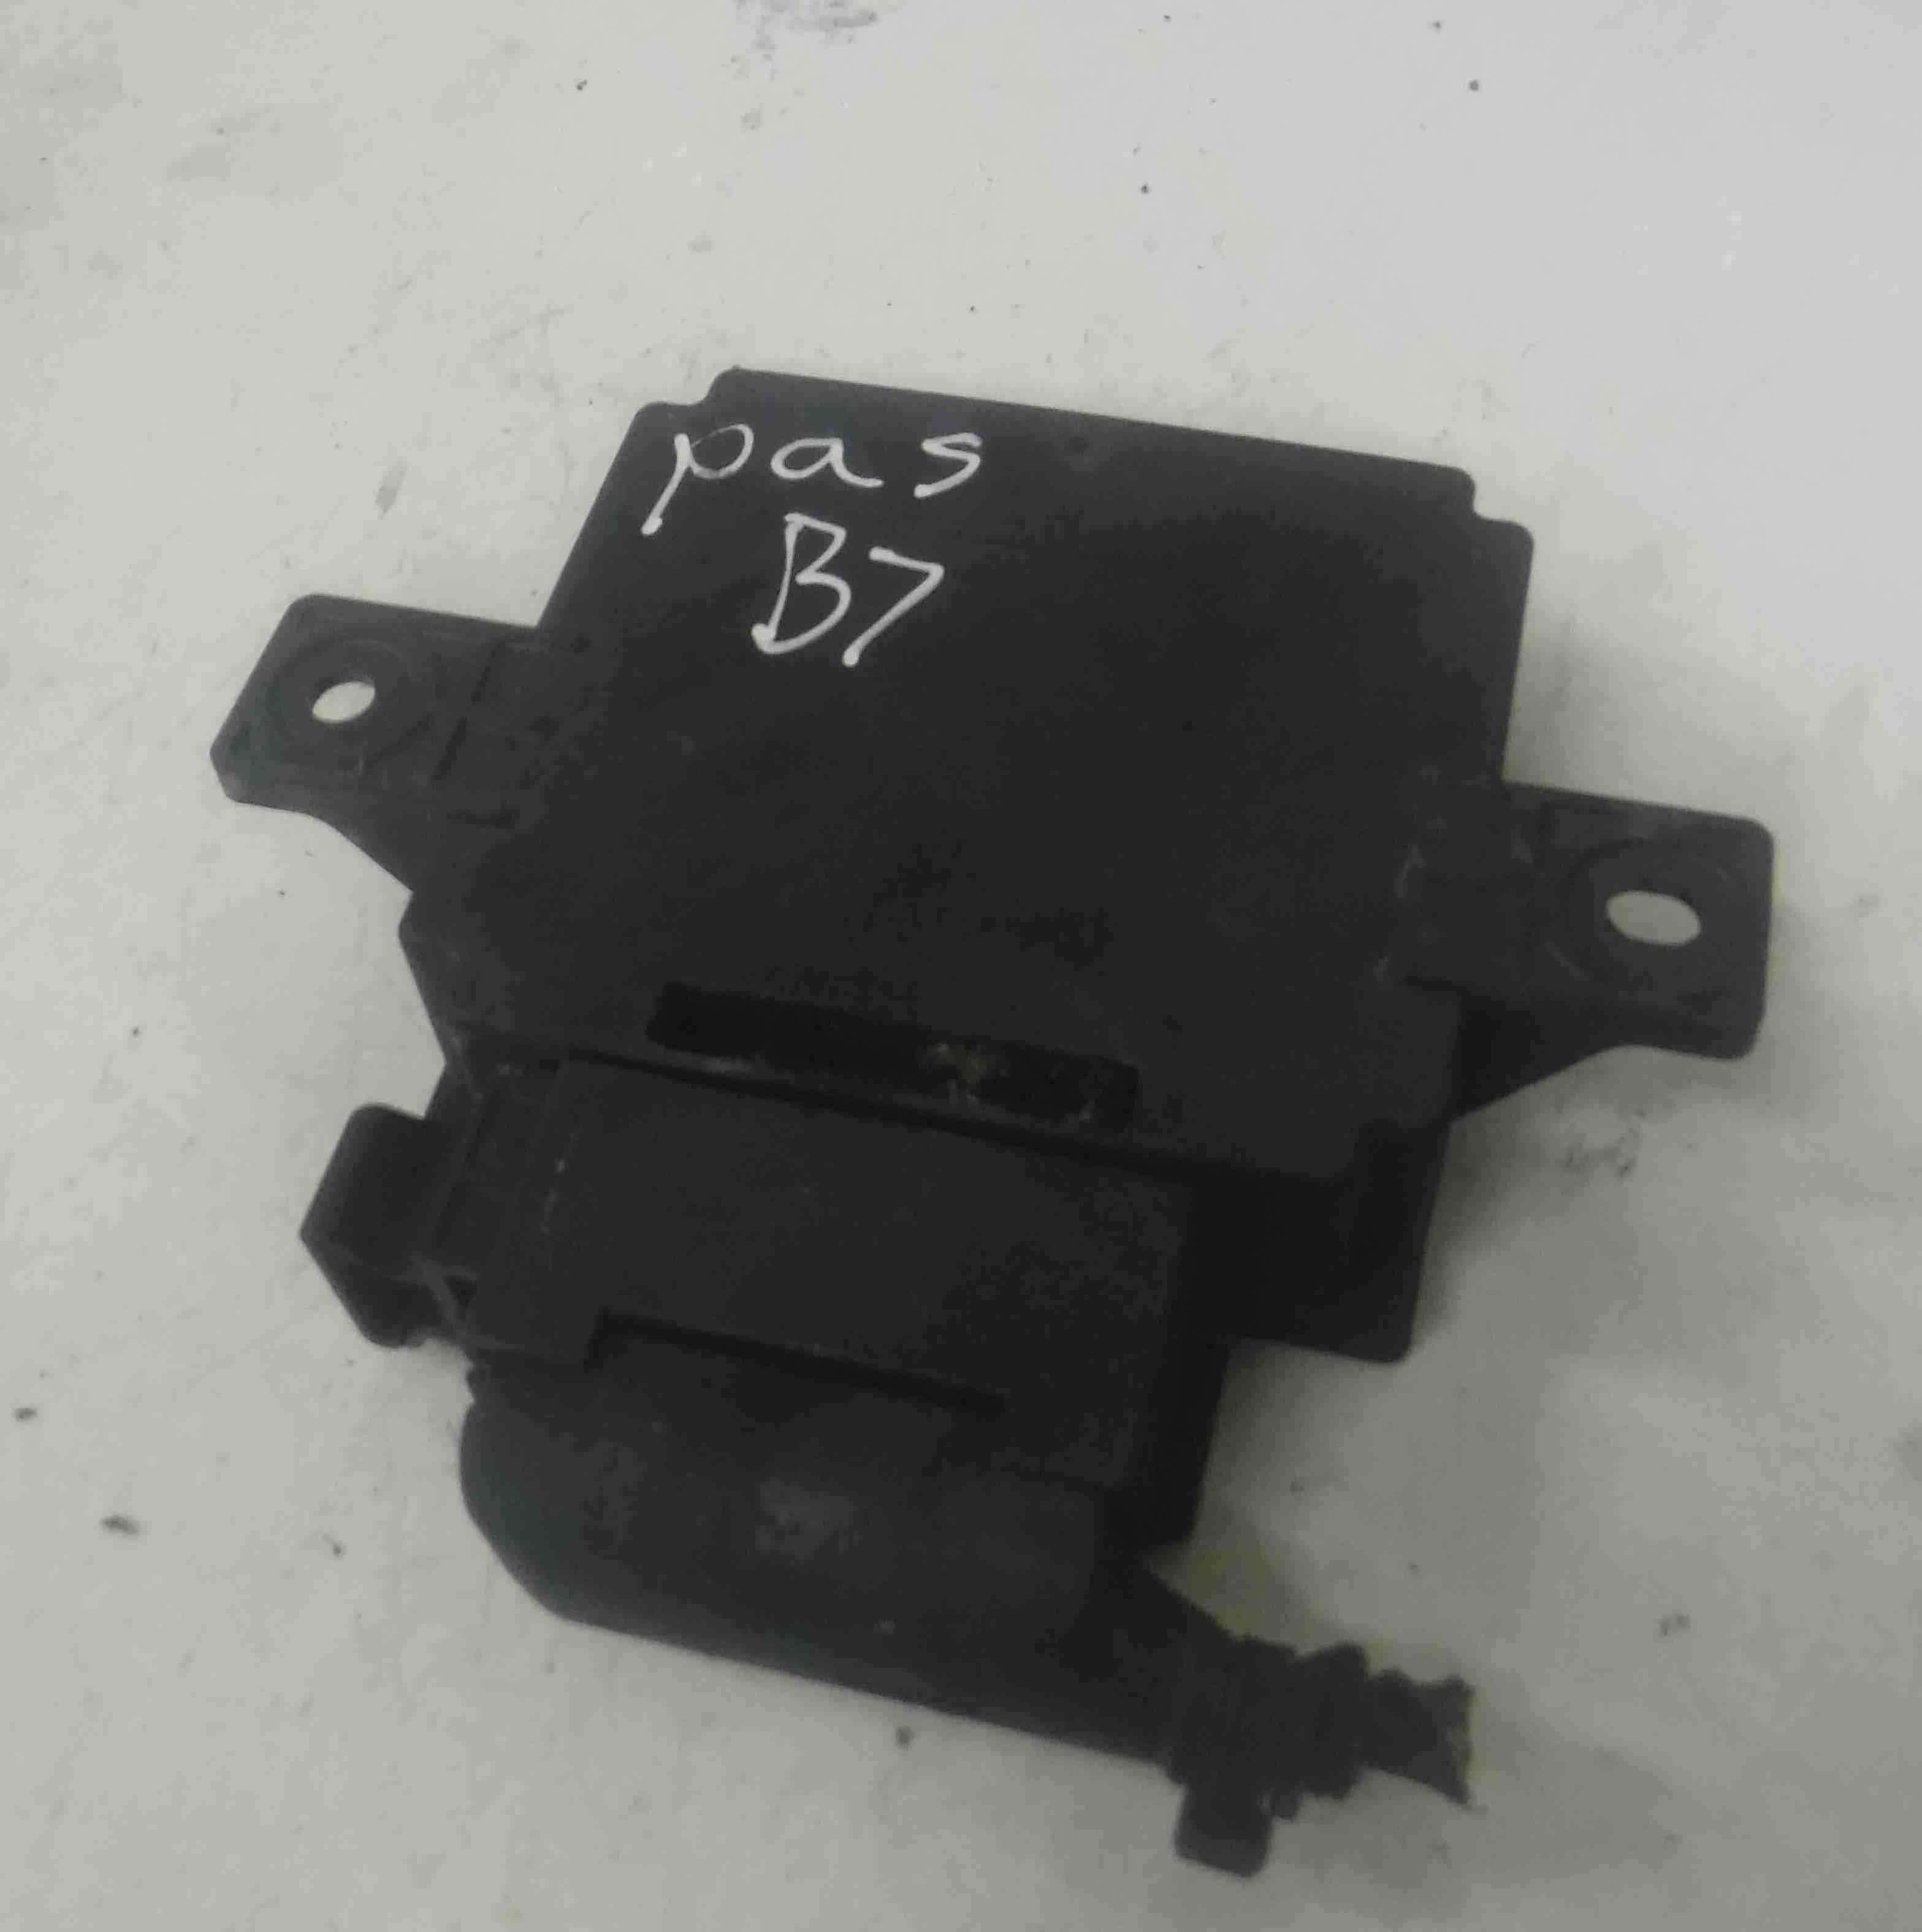 Volkswagen Passat B7 2010-2015 Voltage Stabilizer Control Module 3AA919041